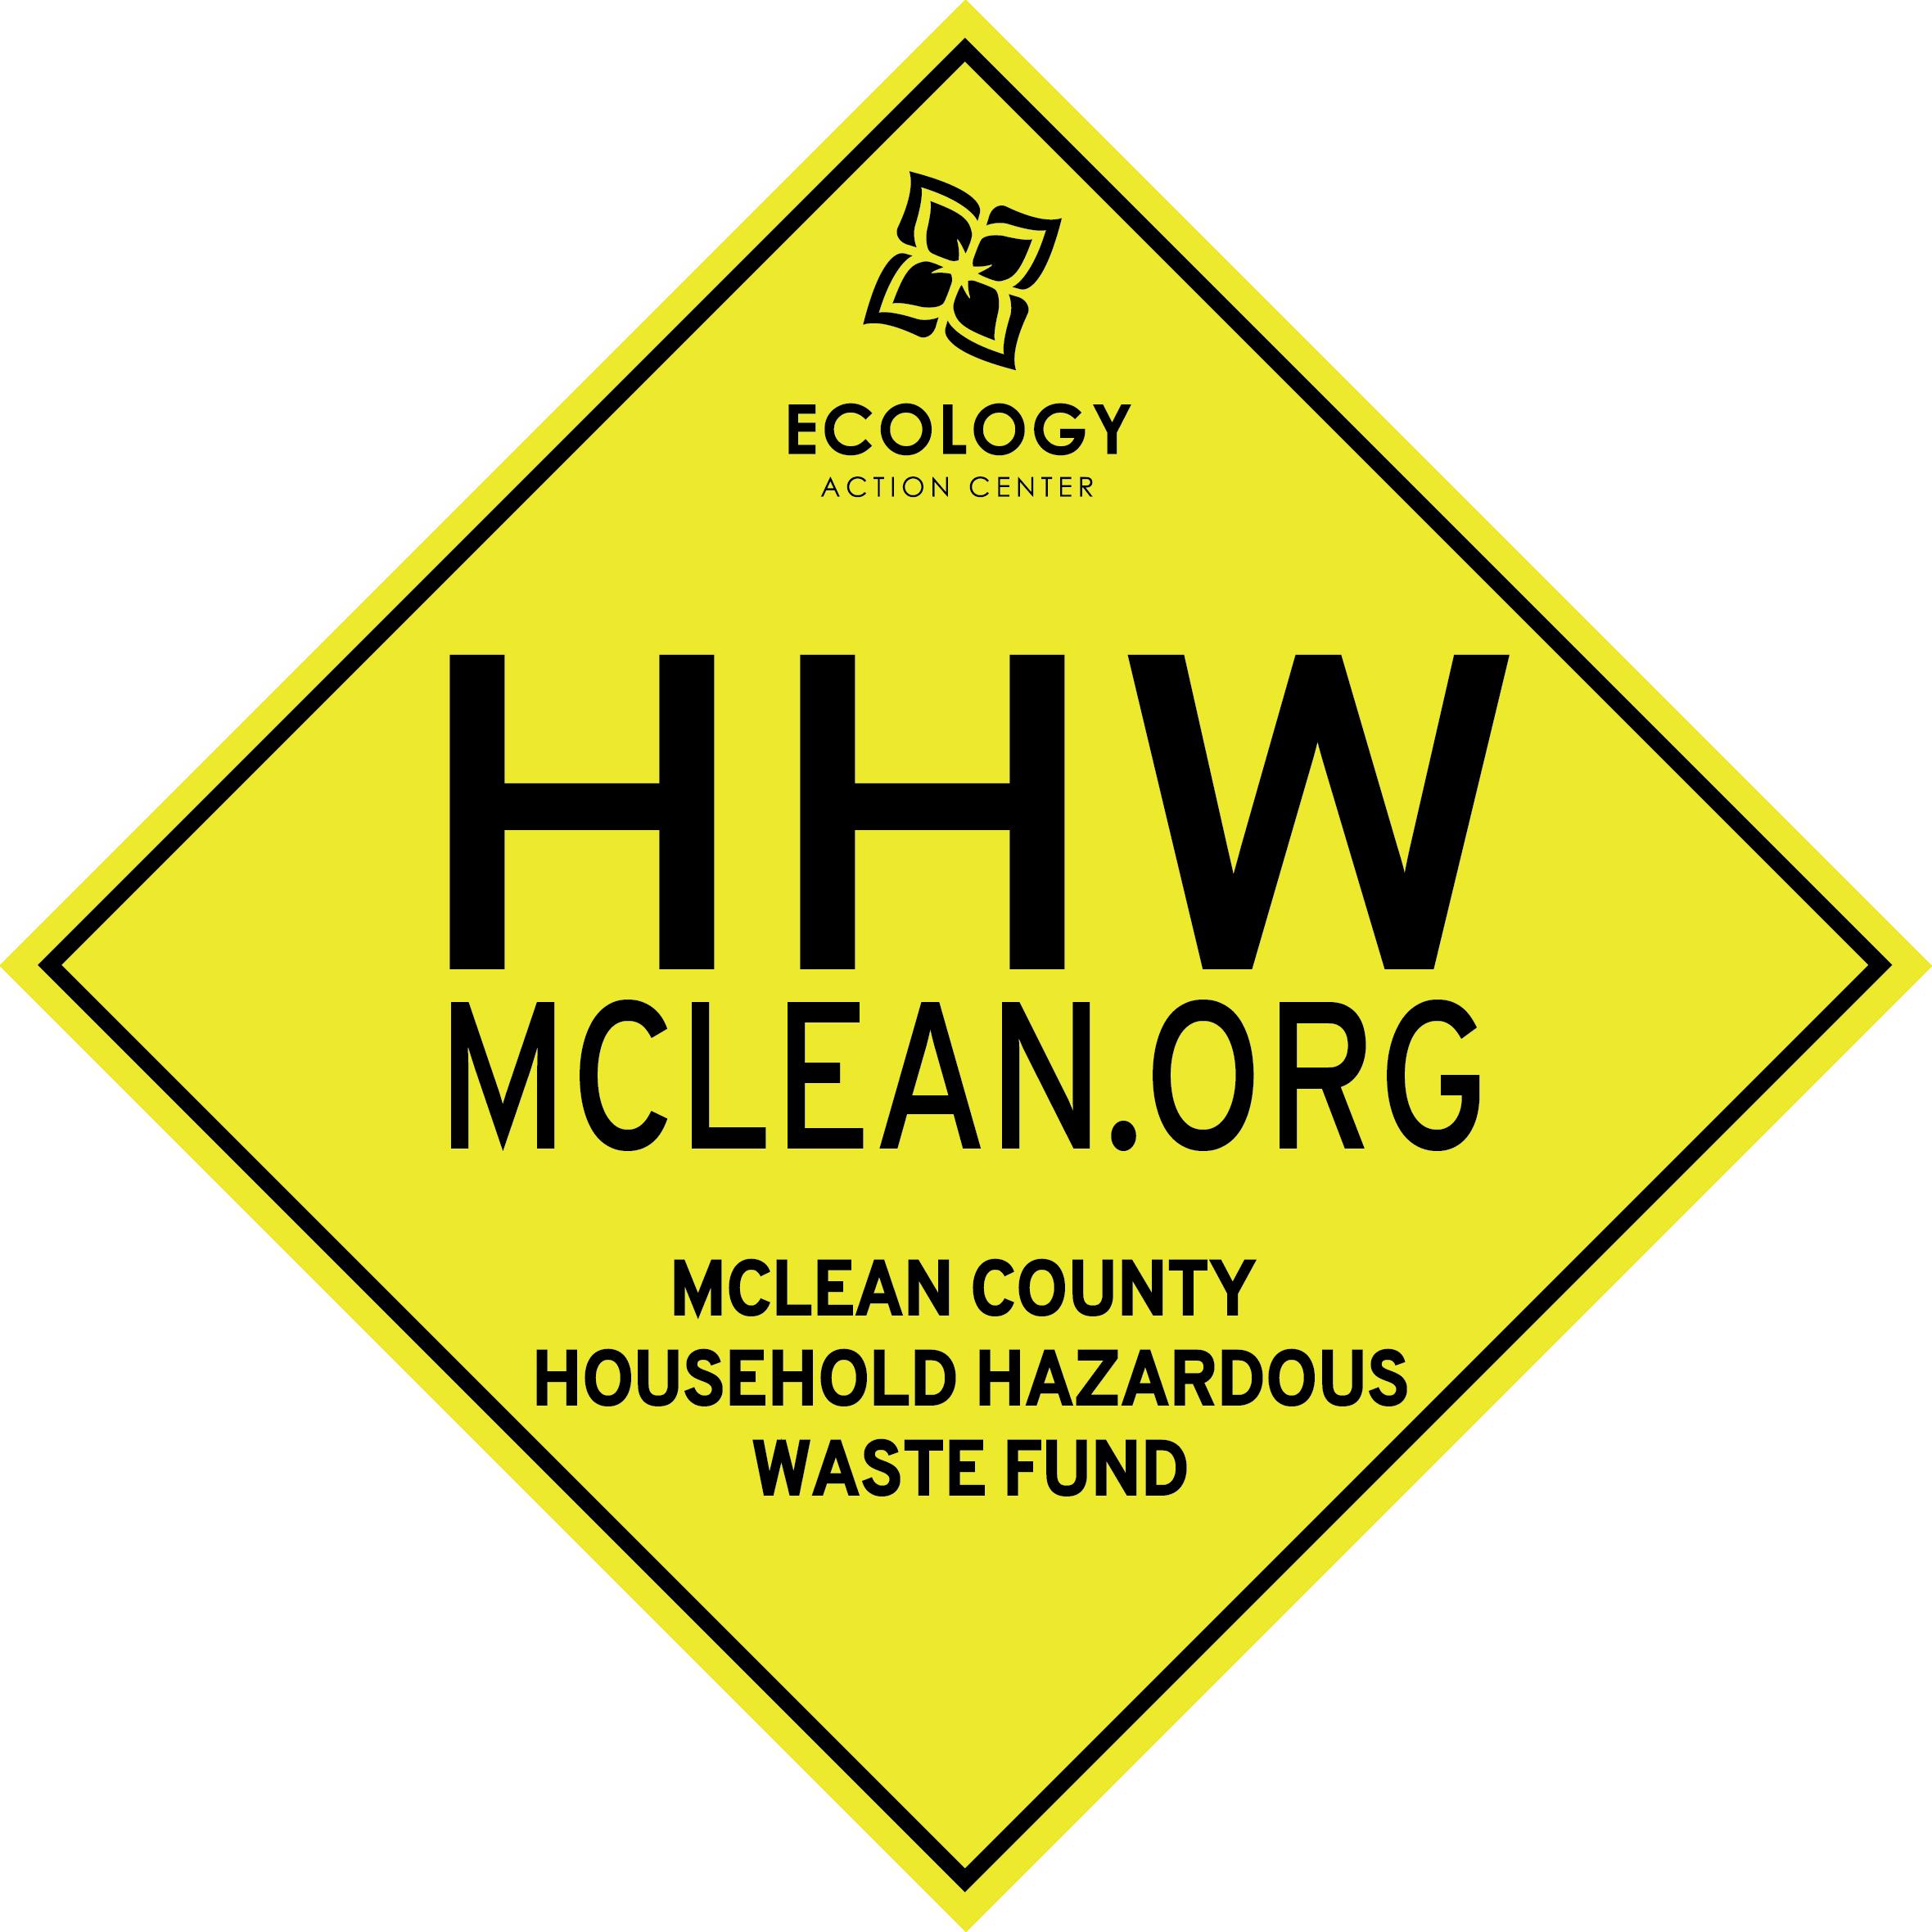 McLean County Household Hazardous Waste Fund